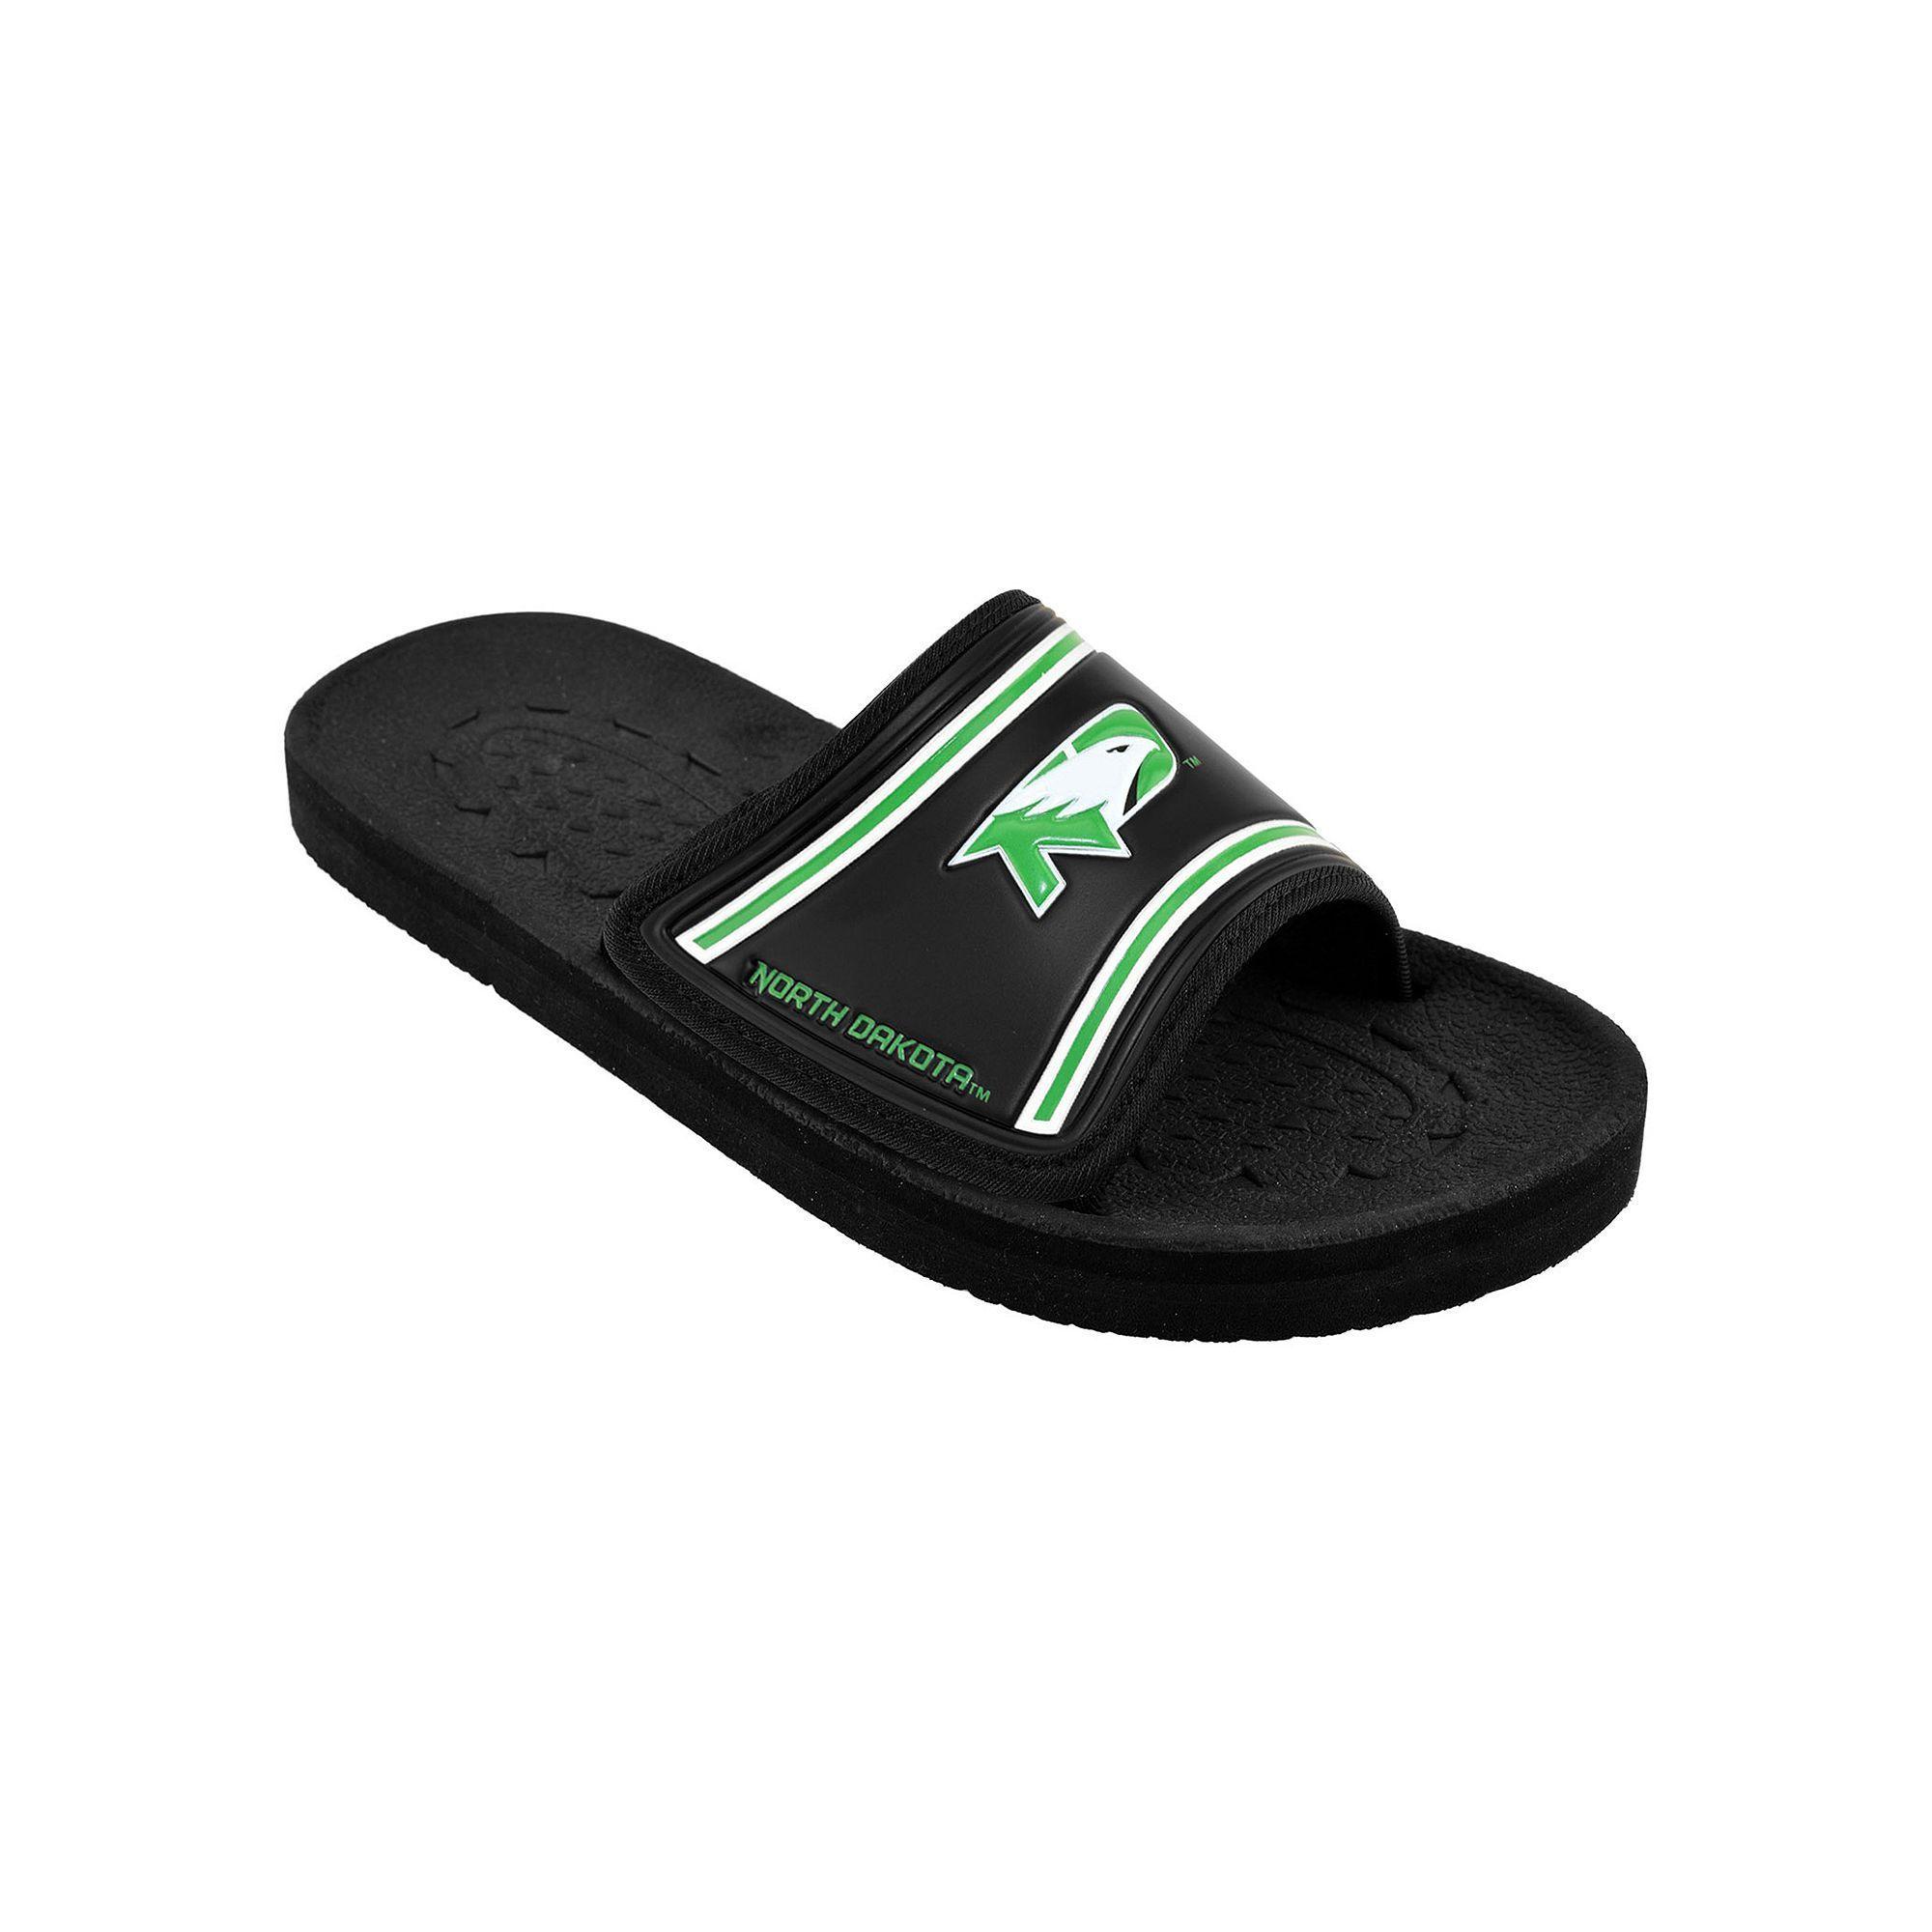 Adult North Dakota Slide ... Sandals purchase online kVcK0